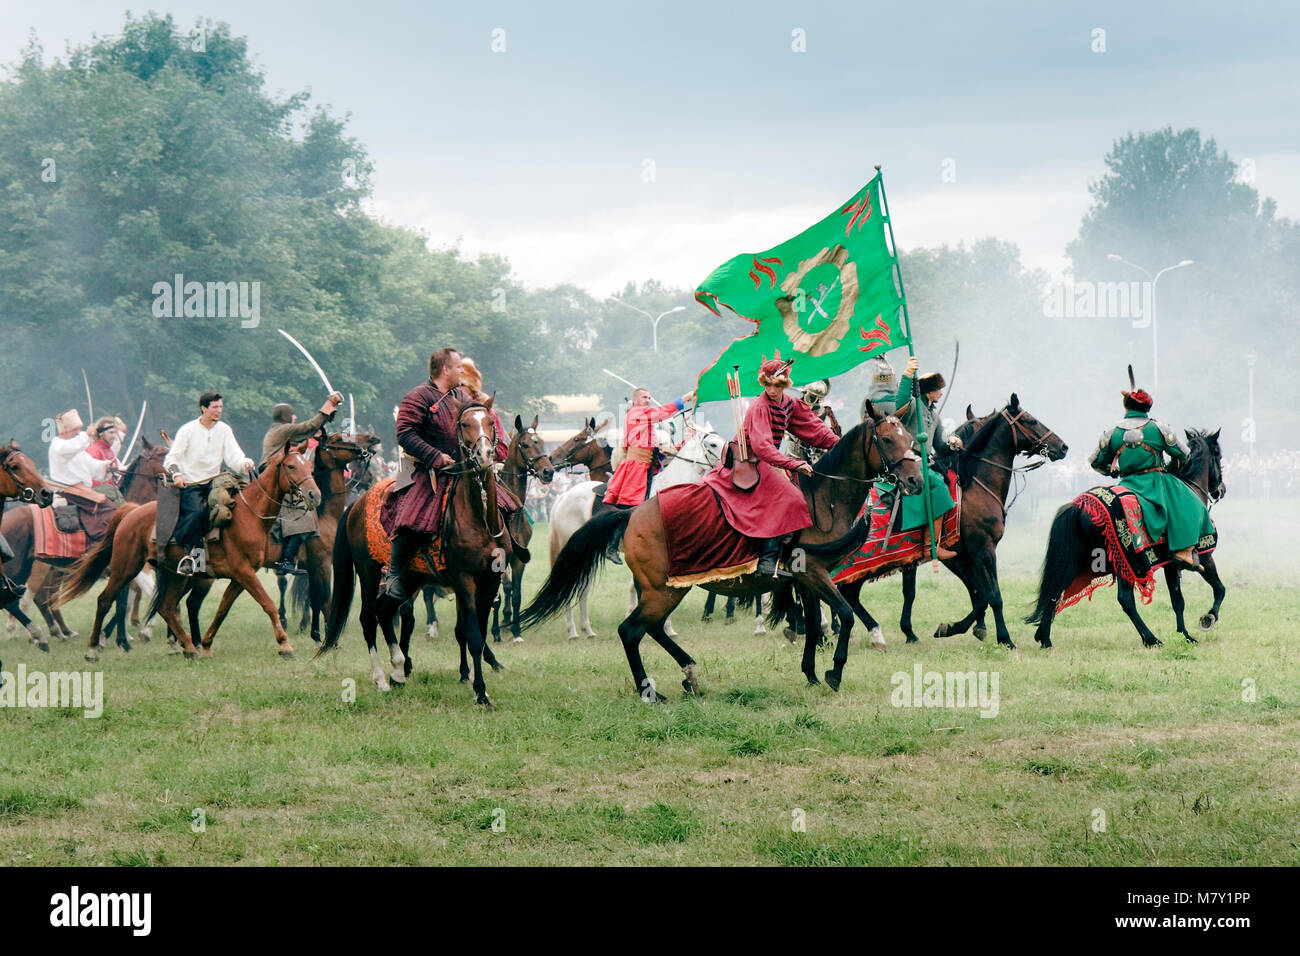 Polish Winged Hussars defeat Russians - Battle of Klushino (KLUSZYN) 1610 - reenactment - July 04, 2010 in Warsaw, Stock Photo